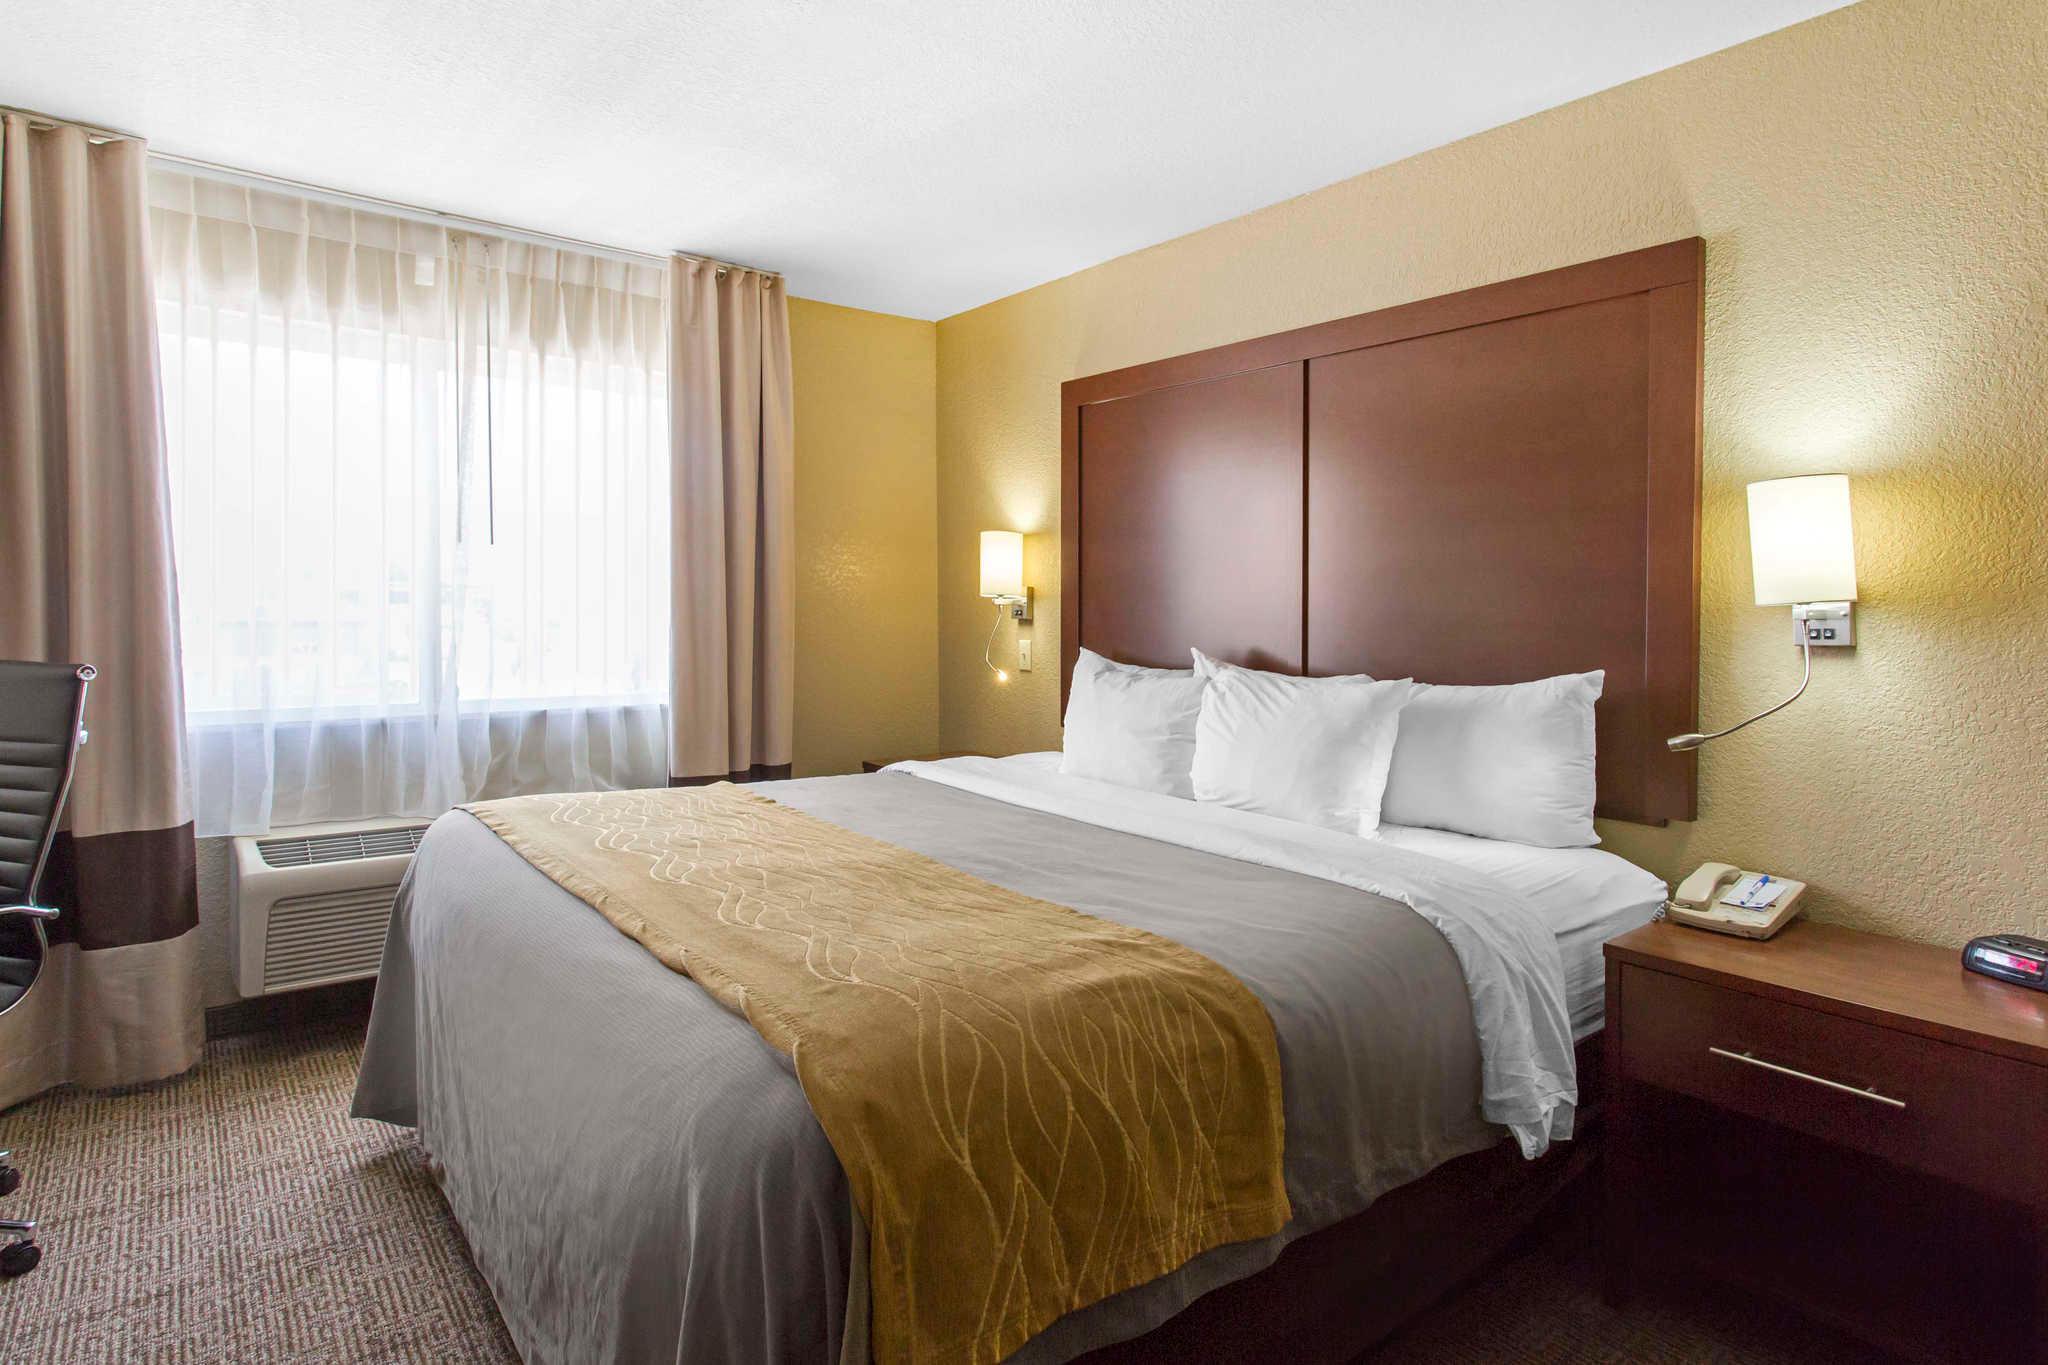 Comfort Inn & Suites image 16